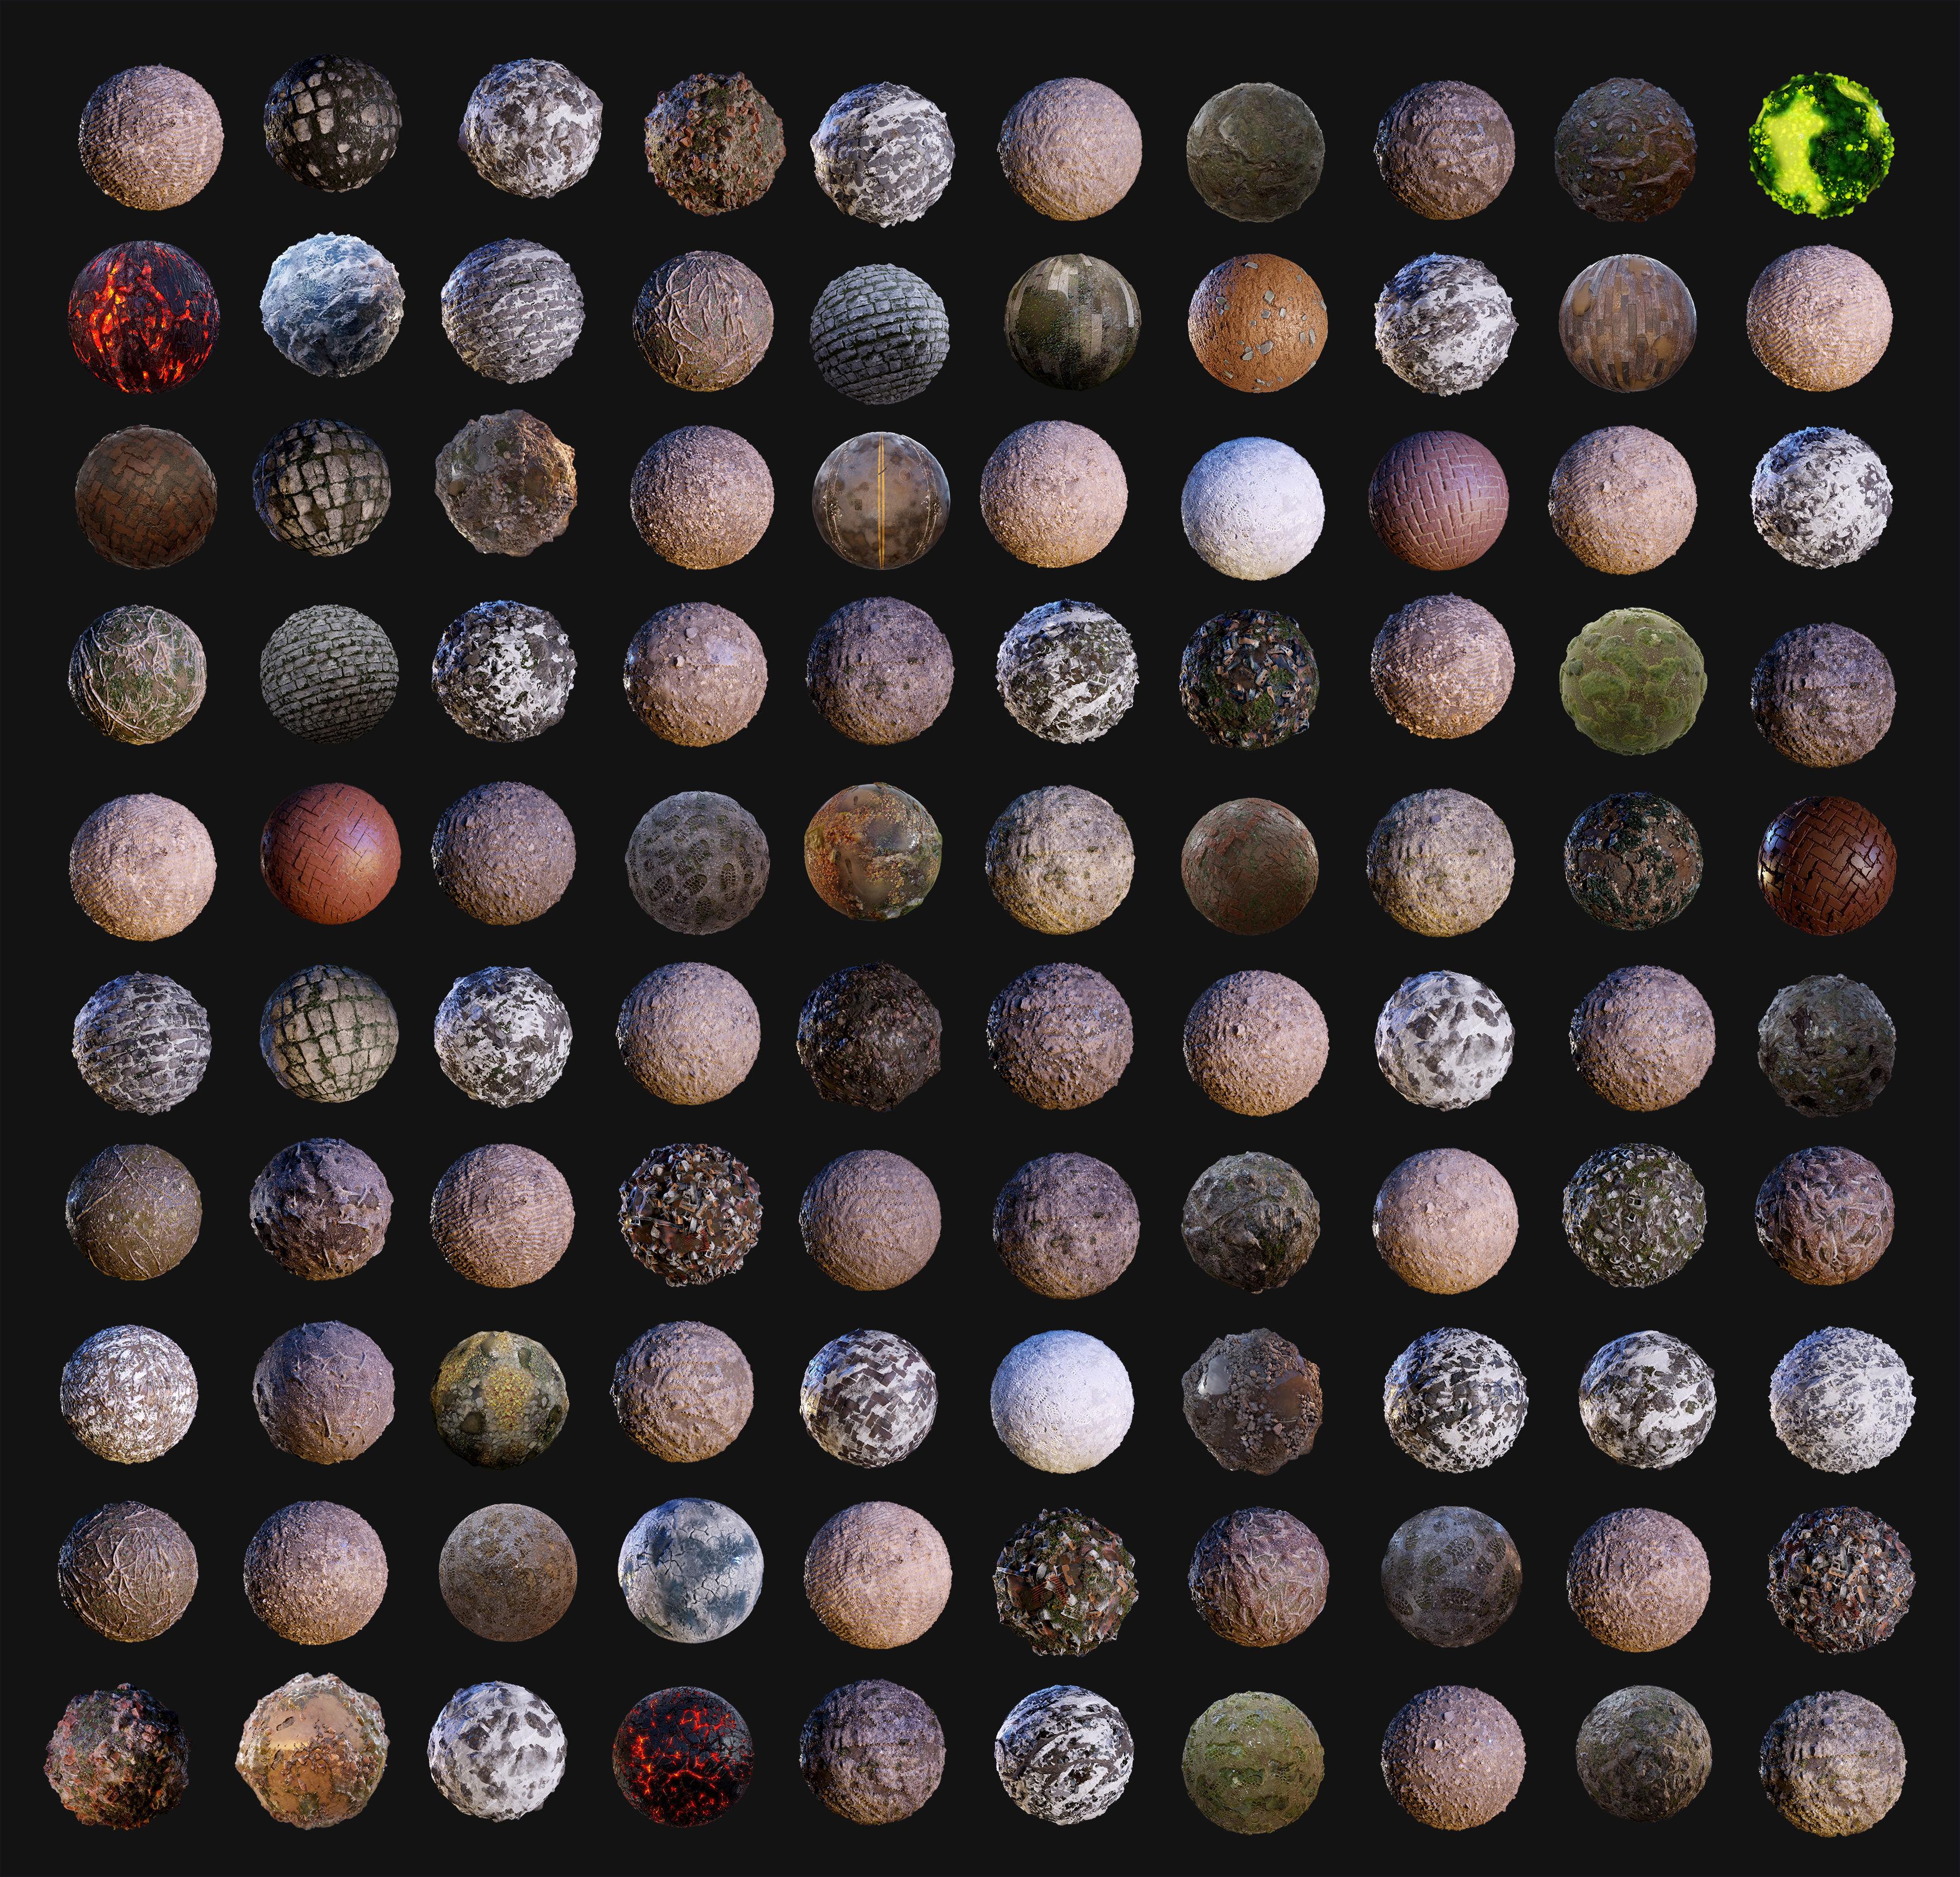 100 Ground Terrain Seamless PBR Textures